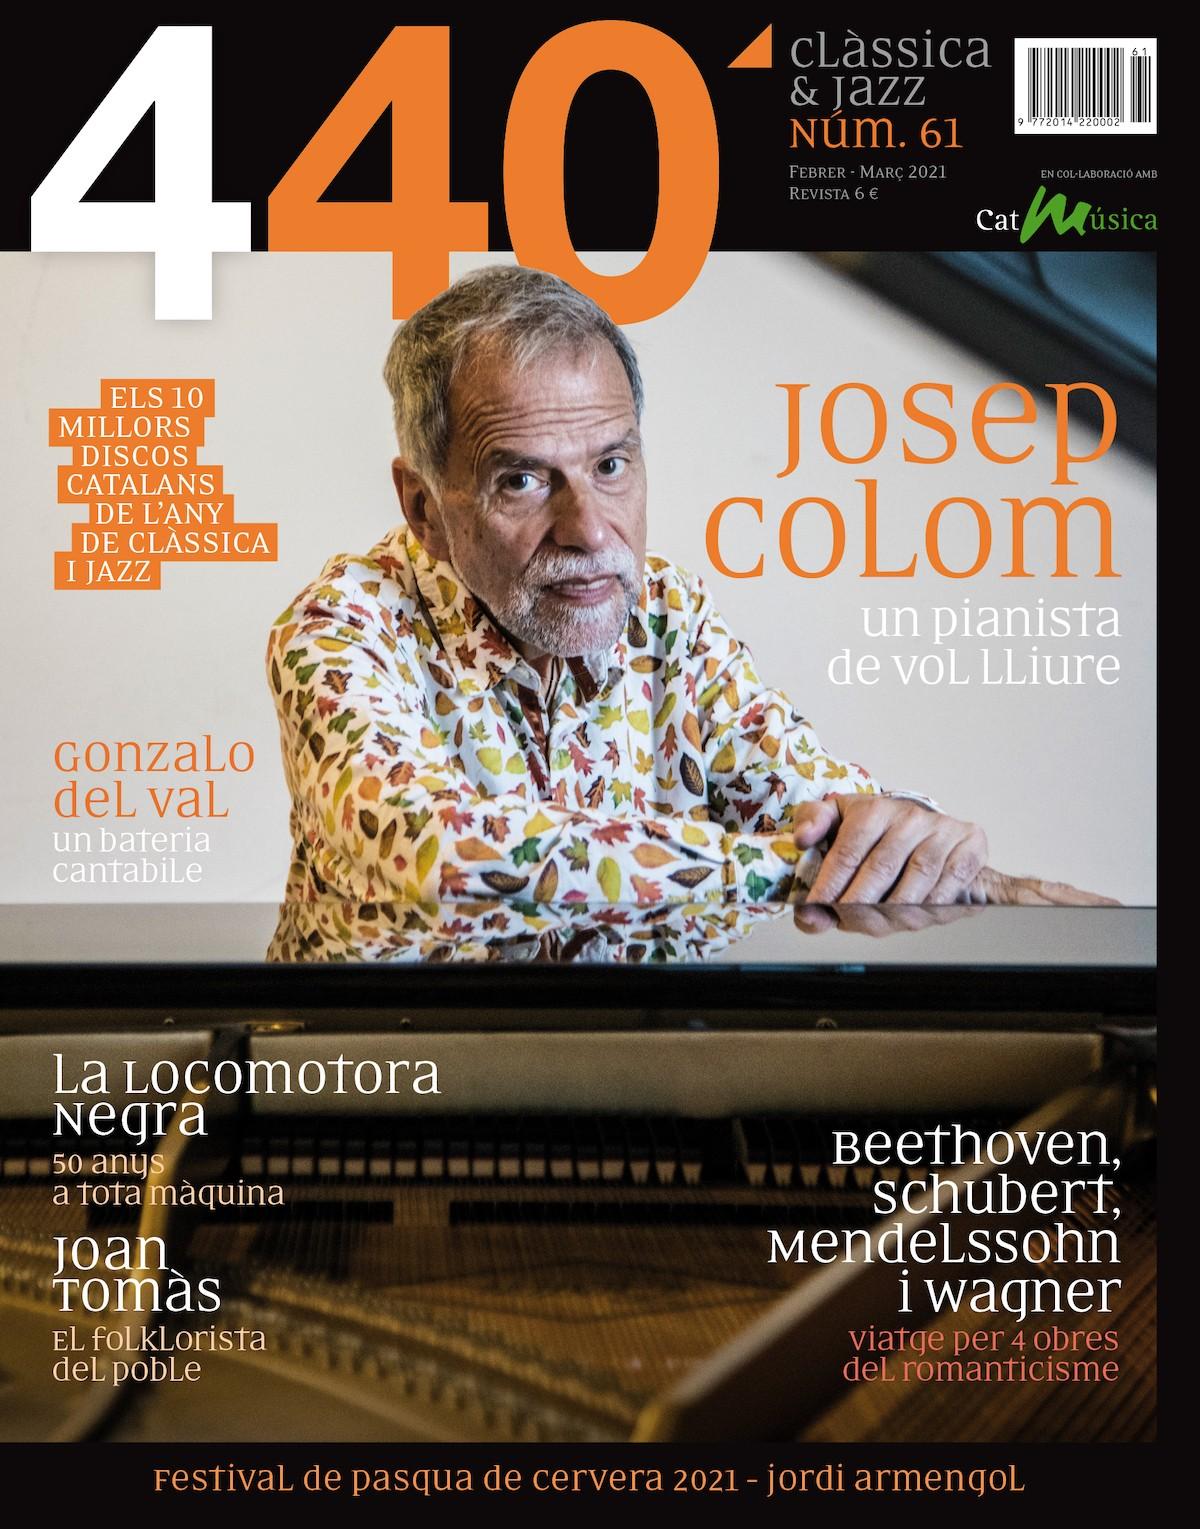 Portada Revista 440Clàssica&Jazz